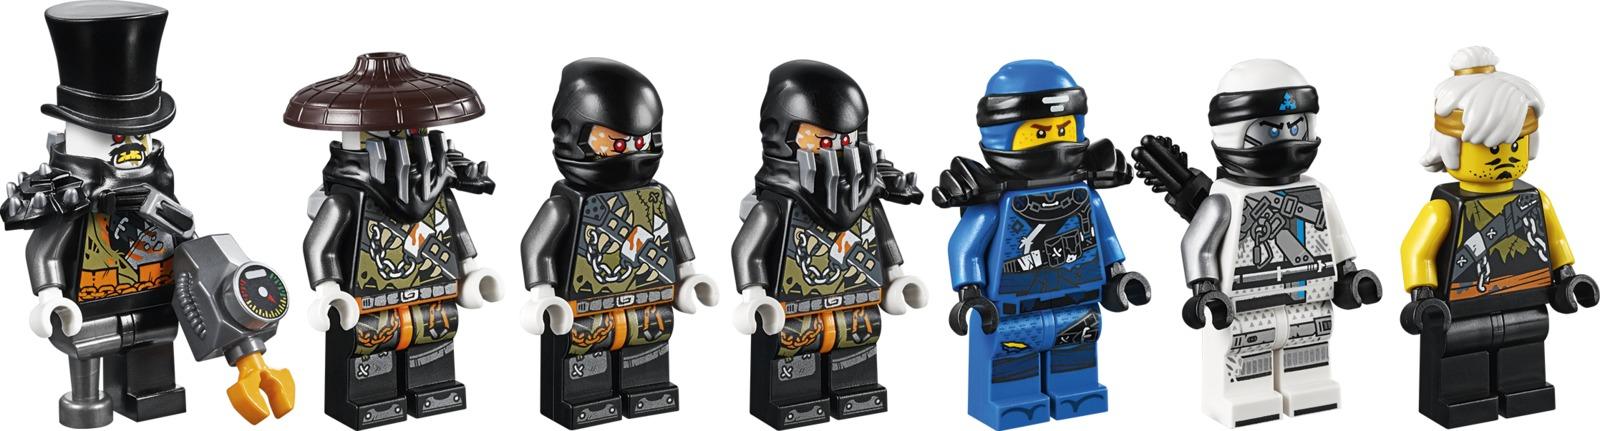 LEGO Ninjago - Dieselnaut (70654) image